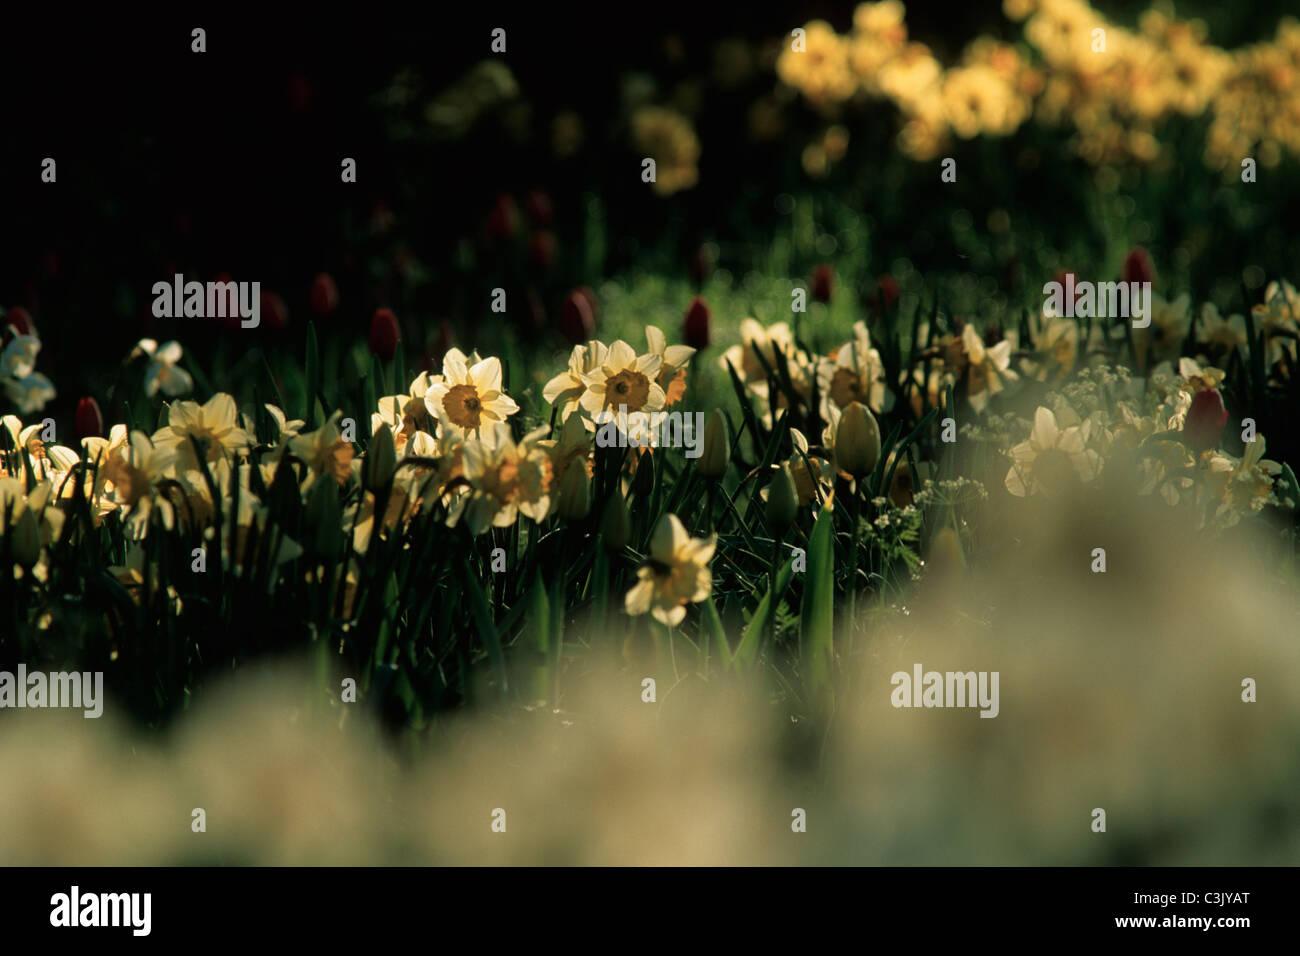 Osterglocke, Narzisse, Narcissus, Daffodils, Insel Mainau, Deutschland, Germany - Stock Image